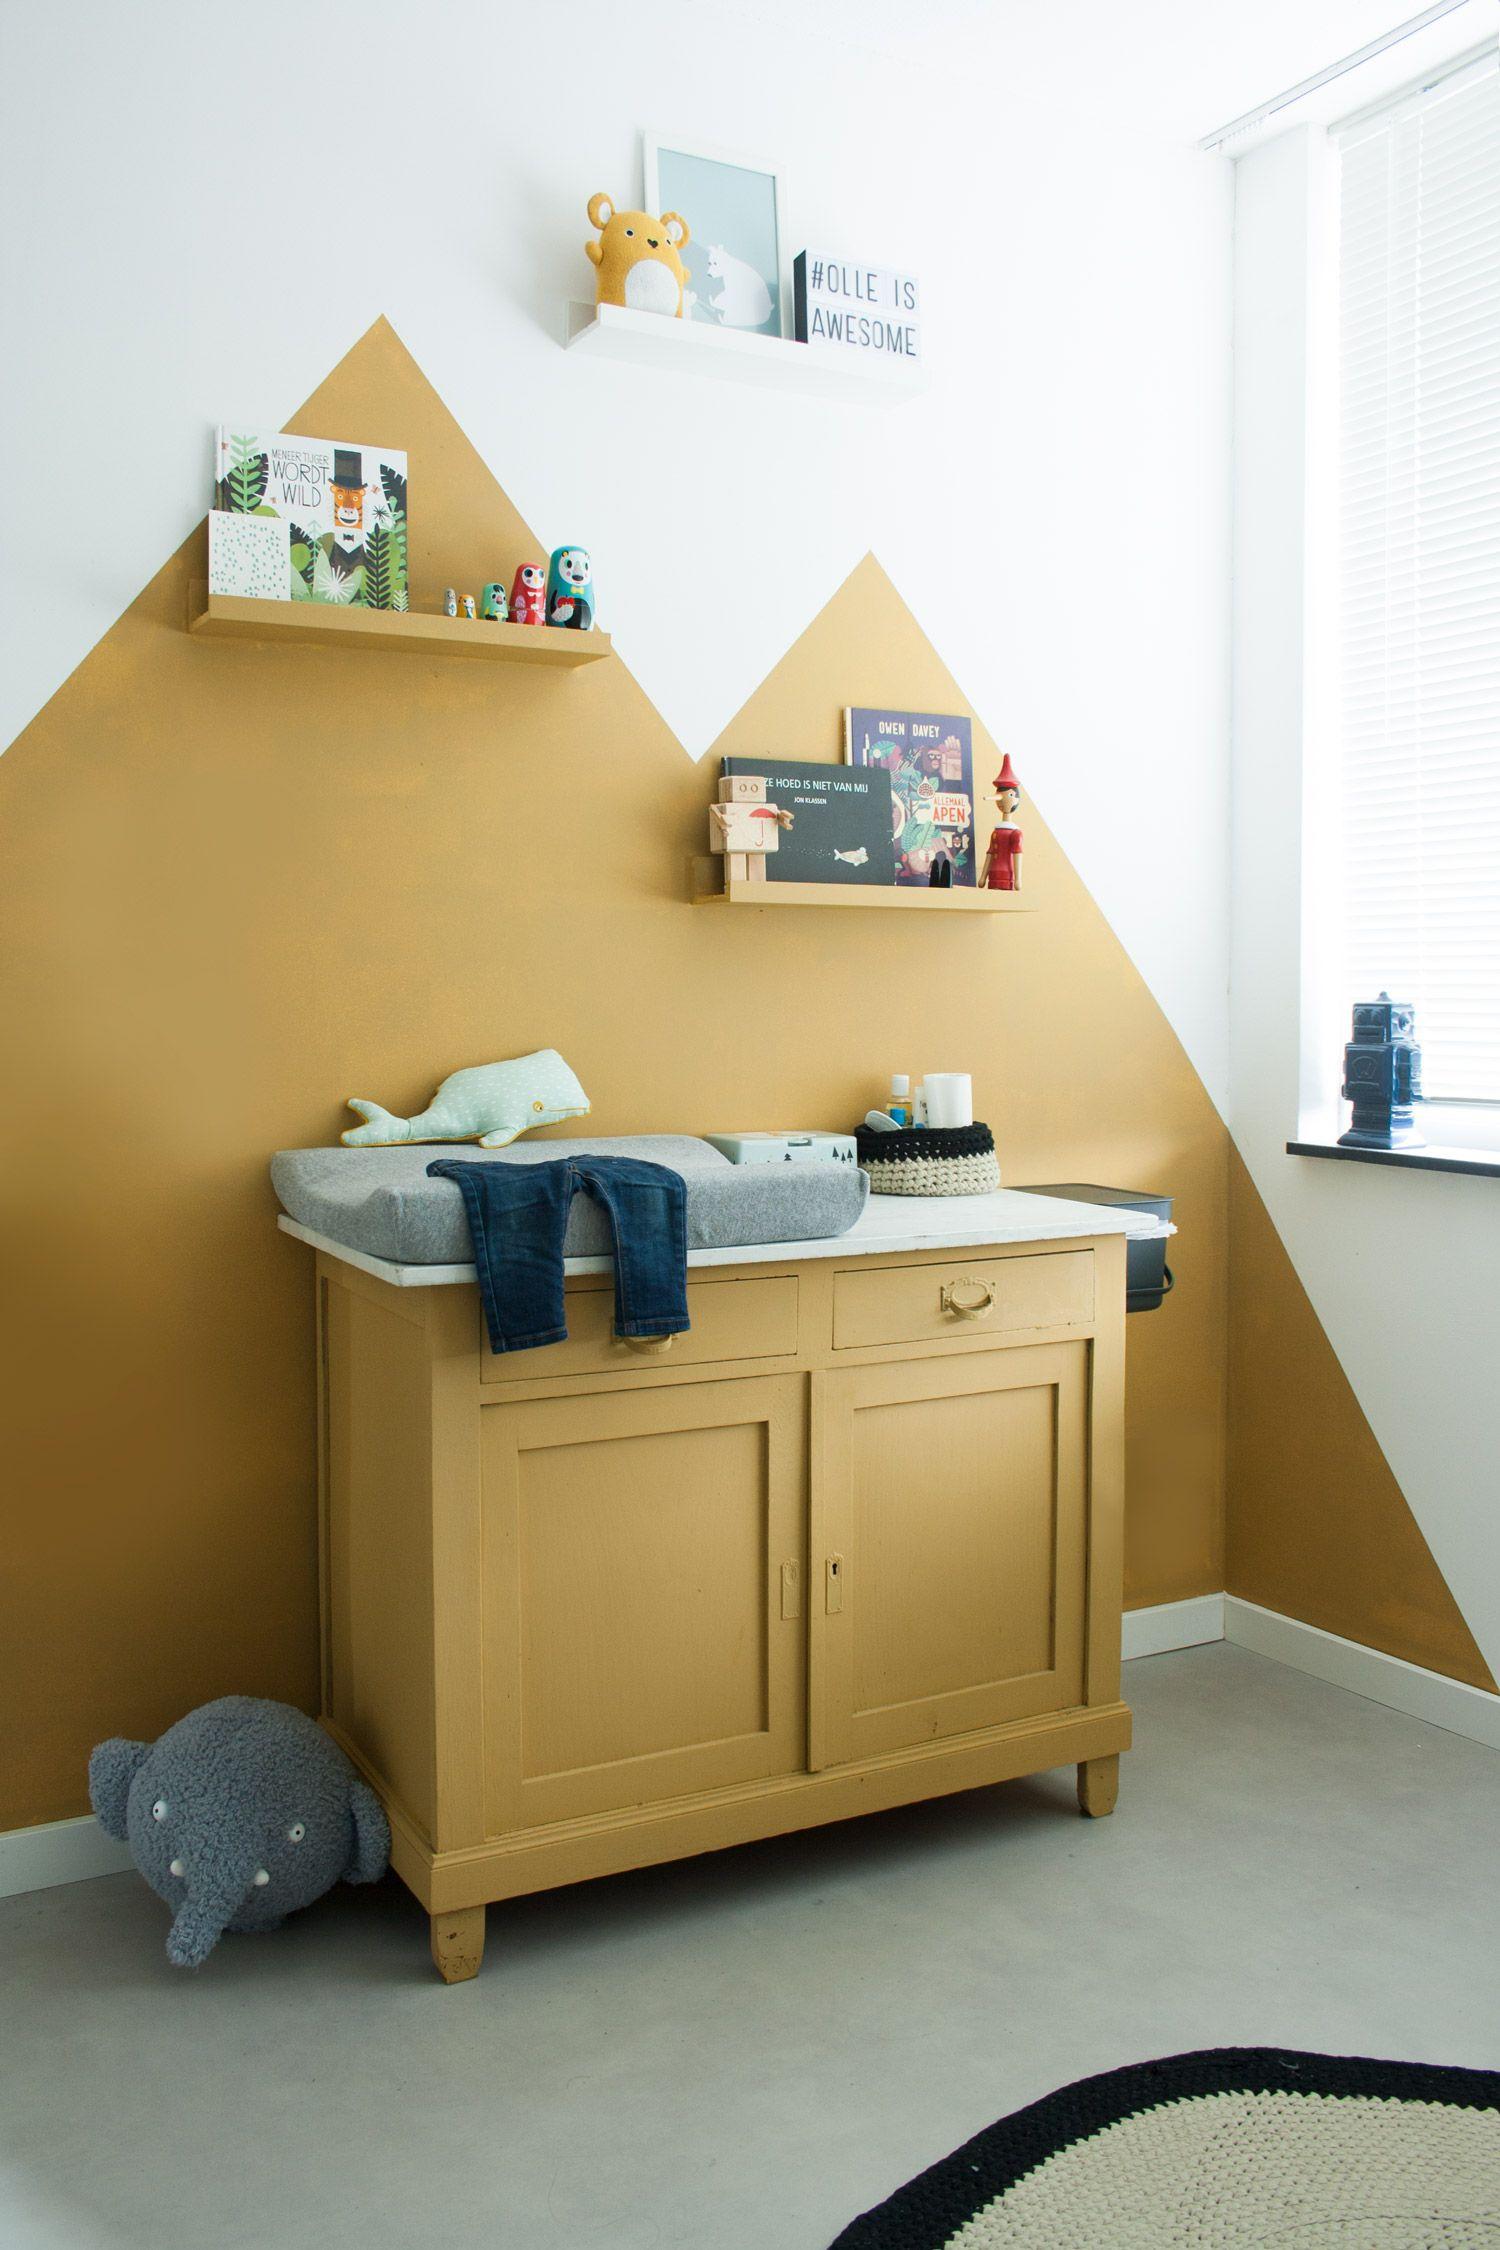 Mooie Baby Slaapkamer.Een Mooie Oker Gele Baby Kamer Kinderkamer Babykamer